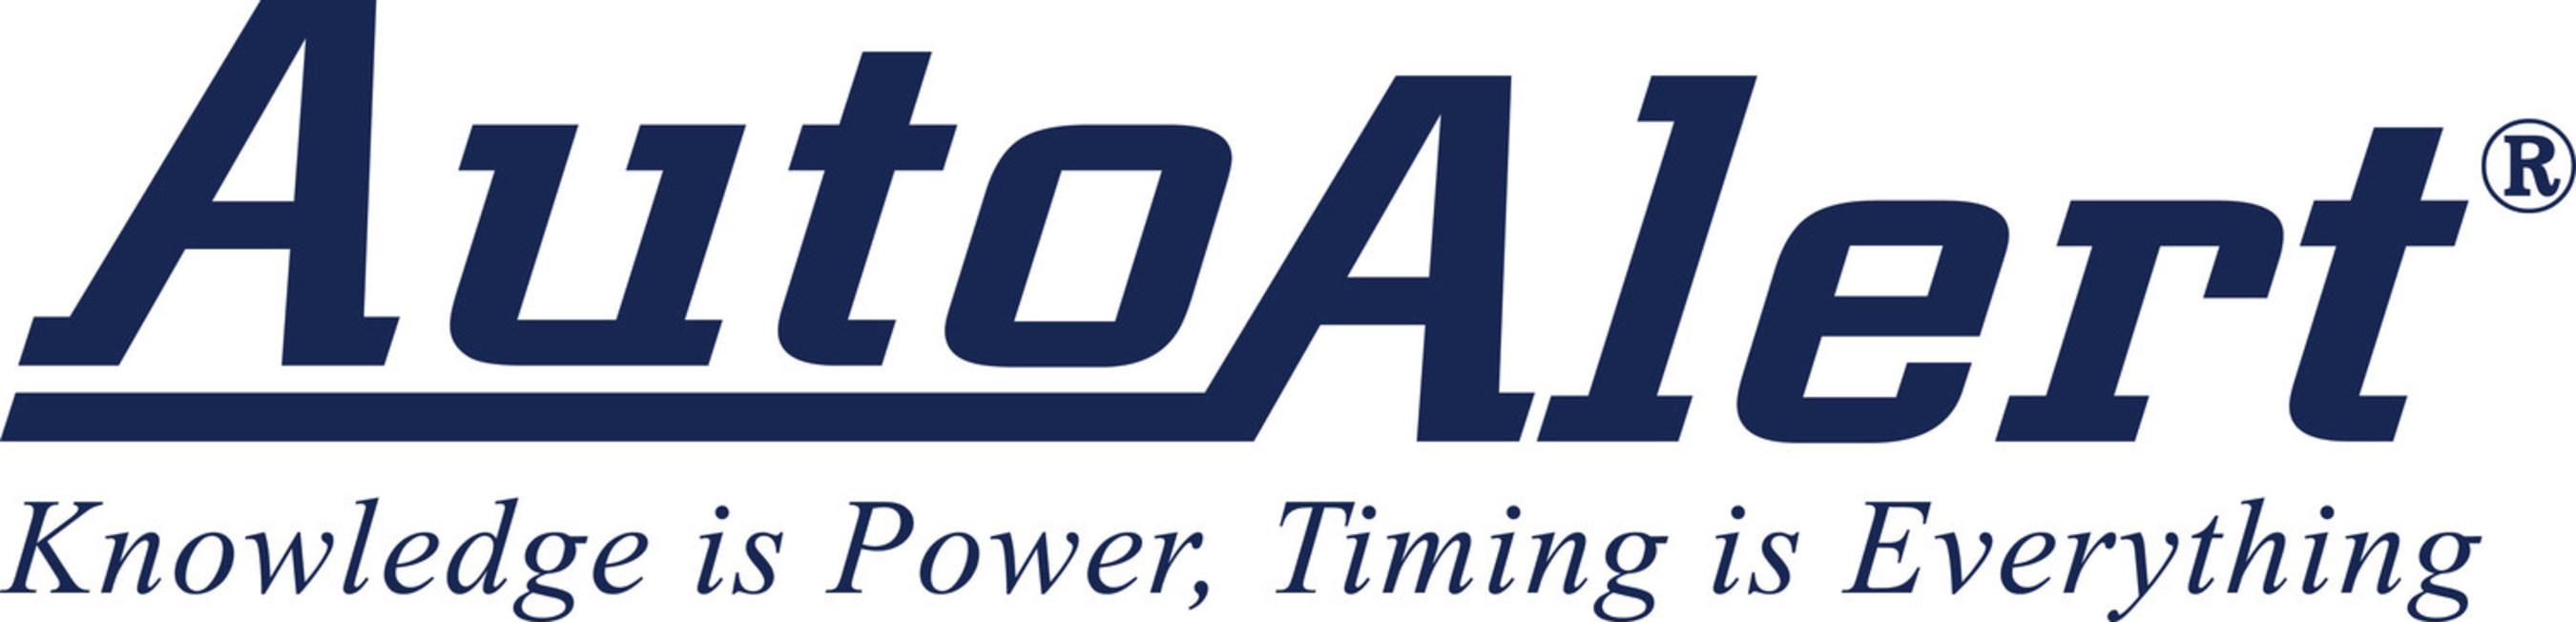 Autoalert Announces Dealer Driven Enhancements To National Program